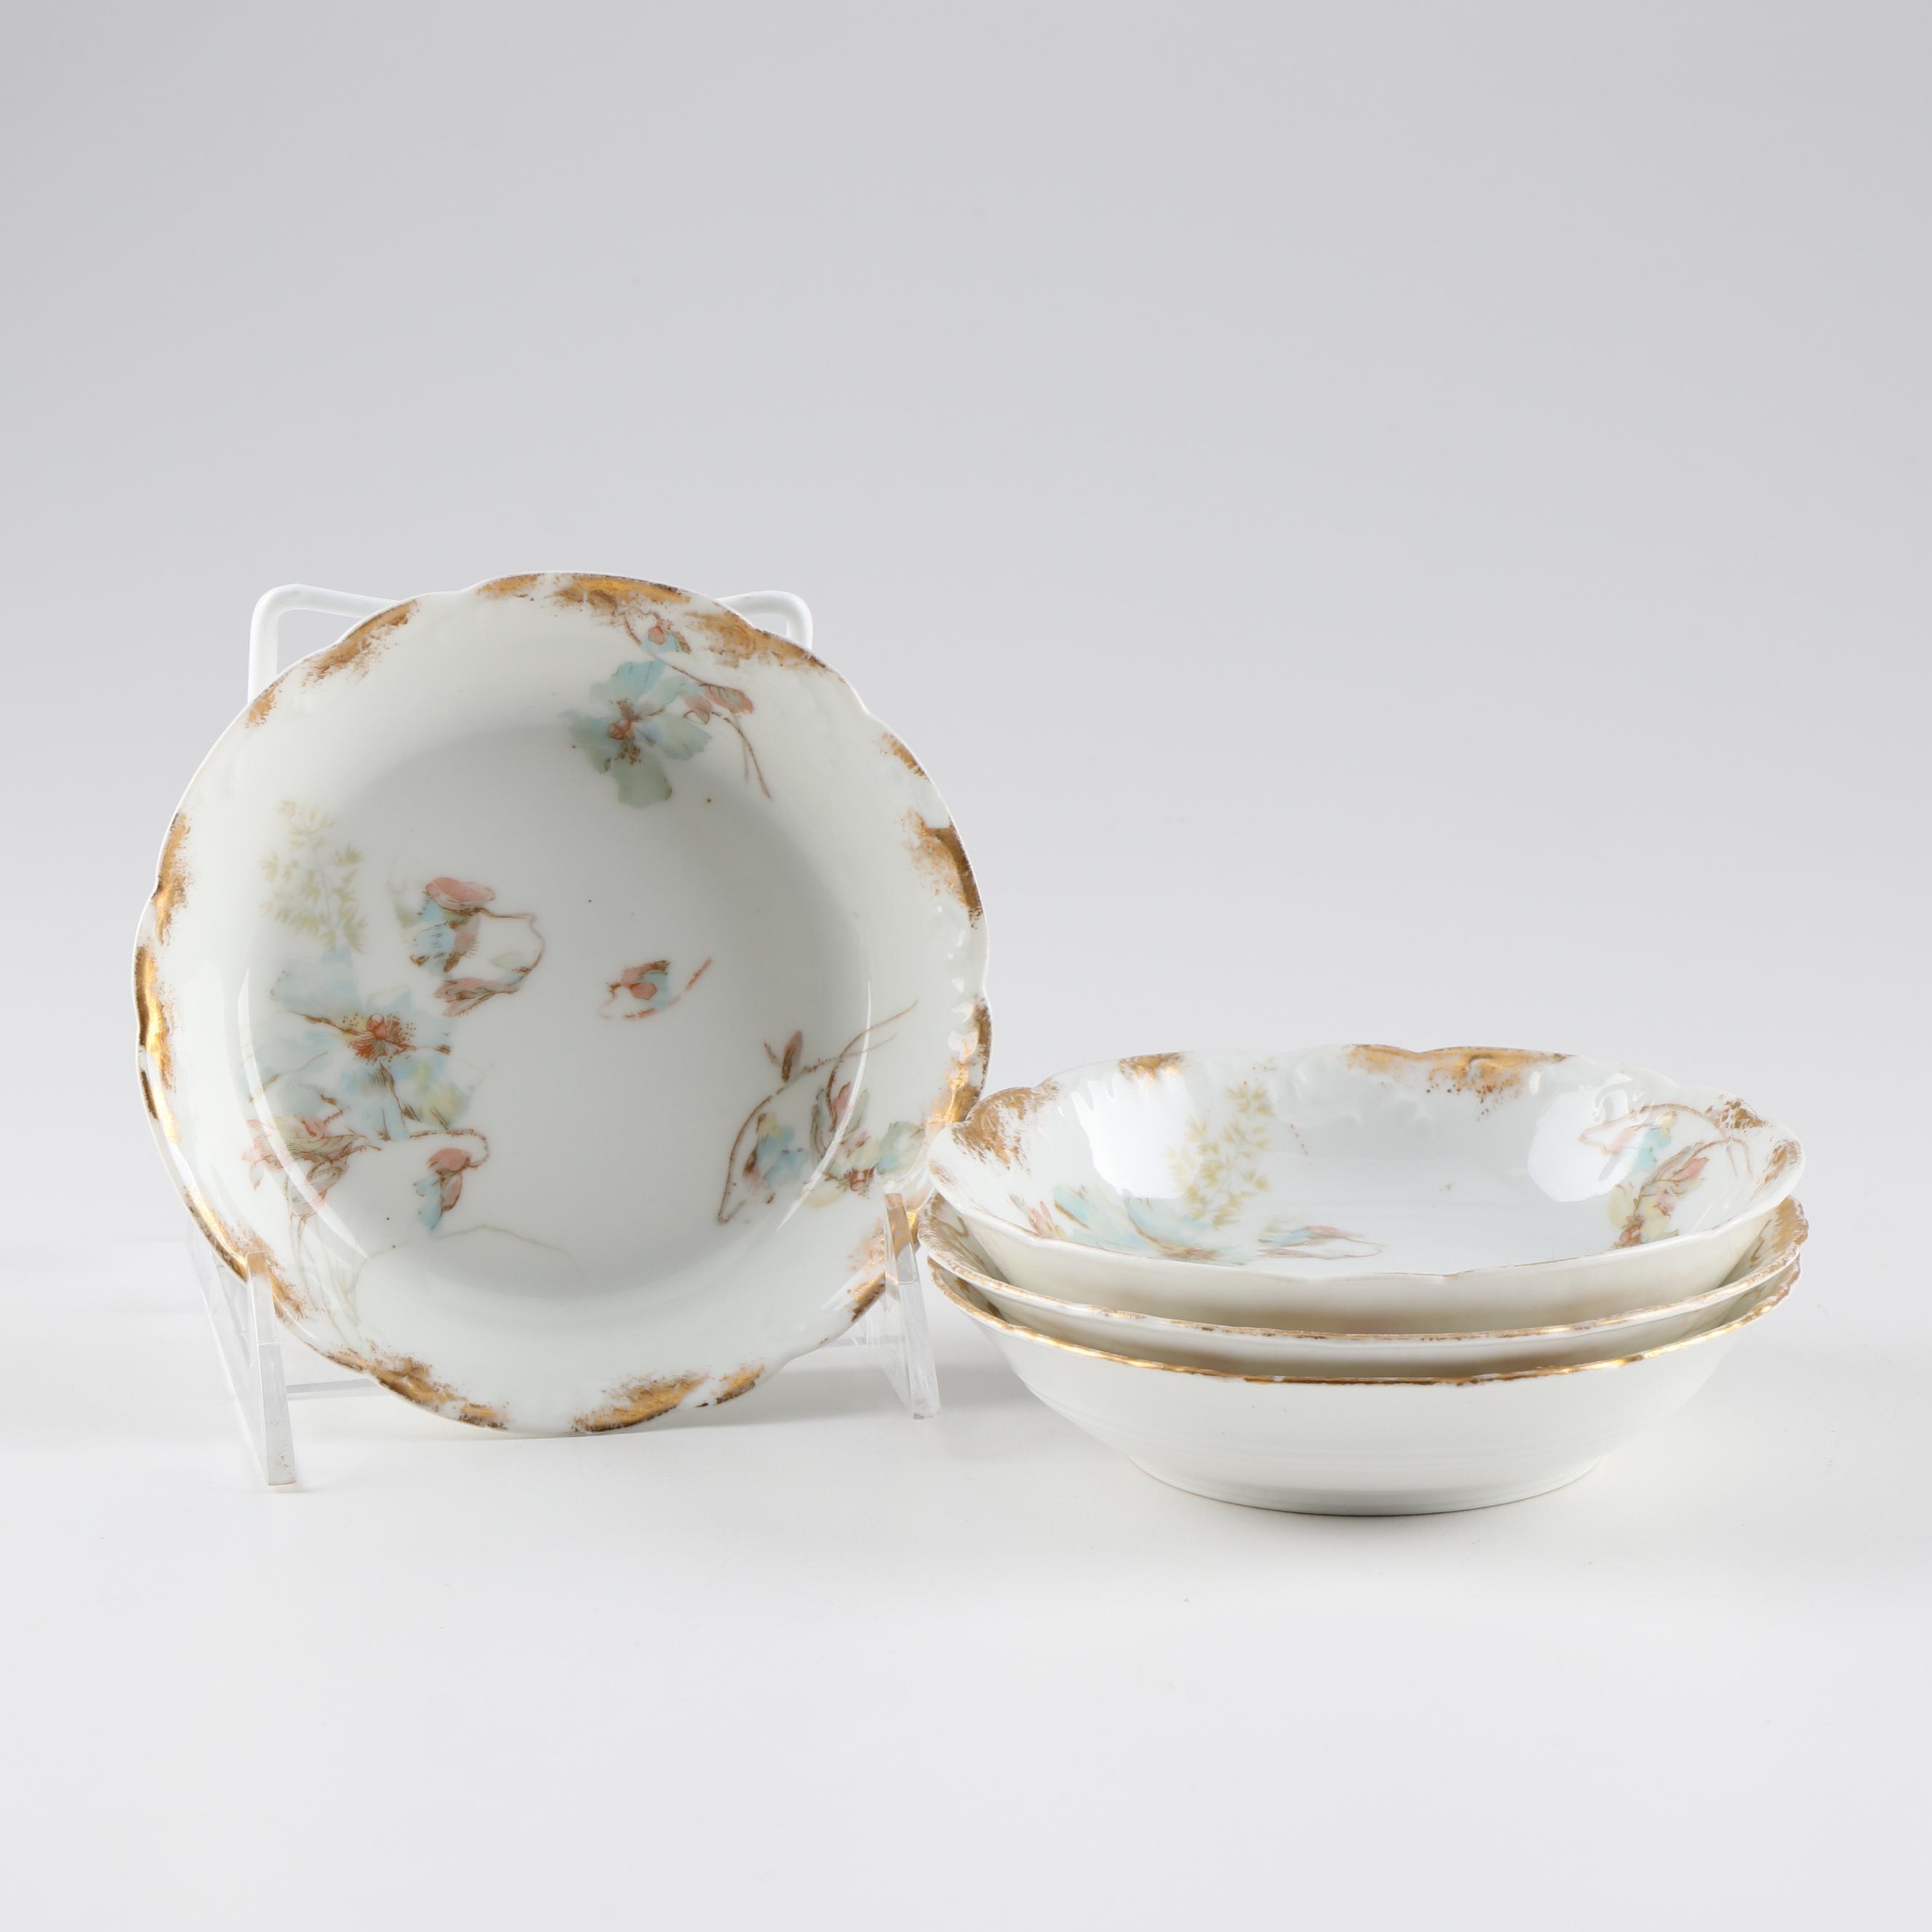 Haviland & Co. Hand-Painted Porcelain Dessert Bowls